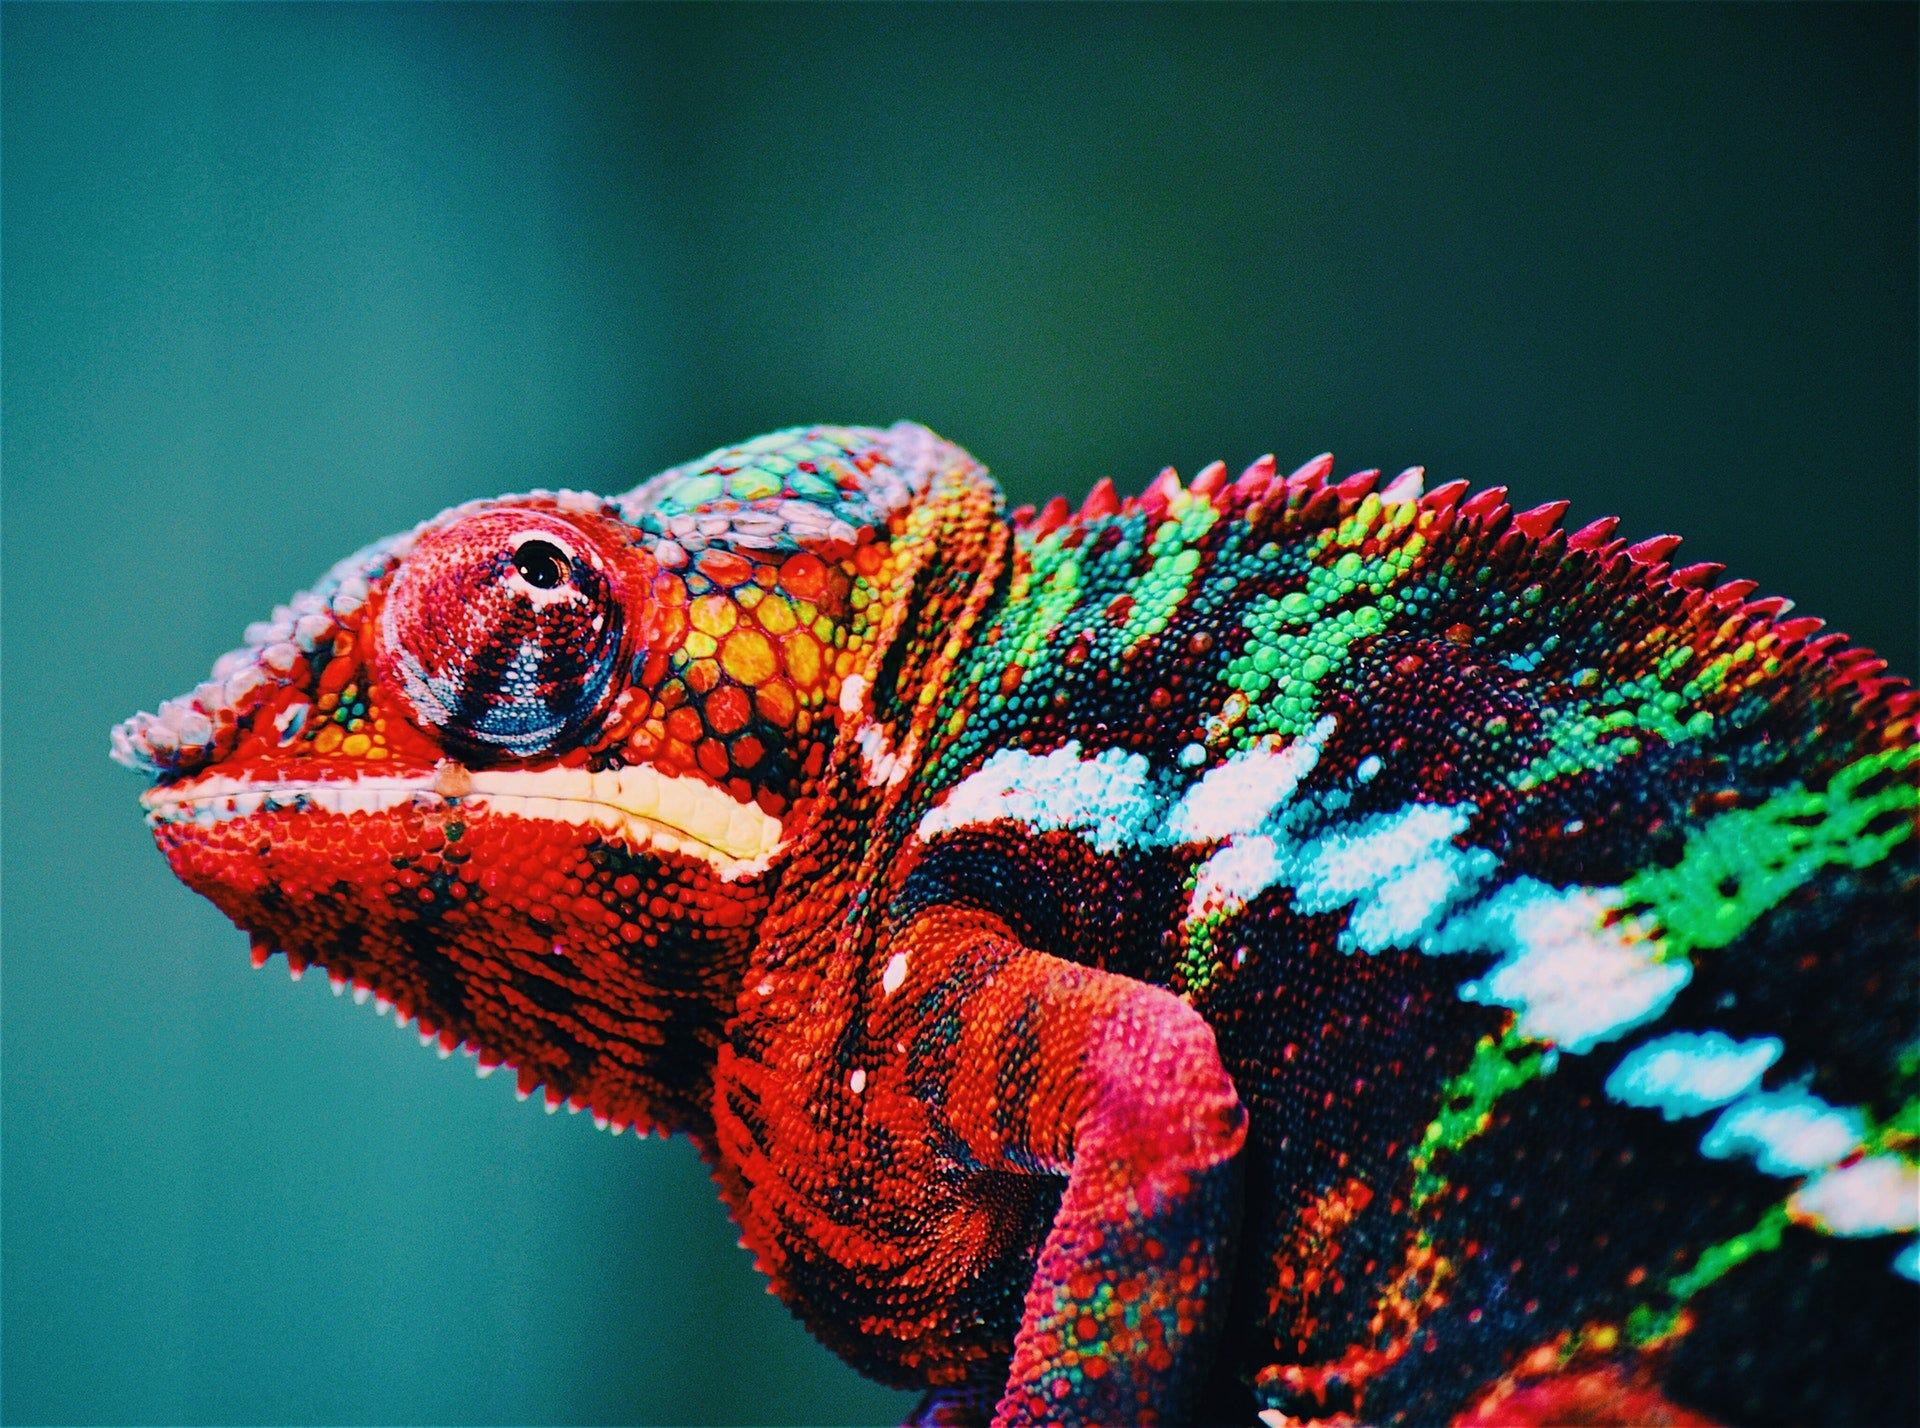 Pantone chameleon